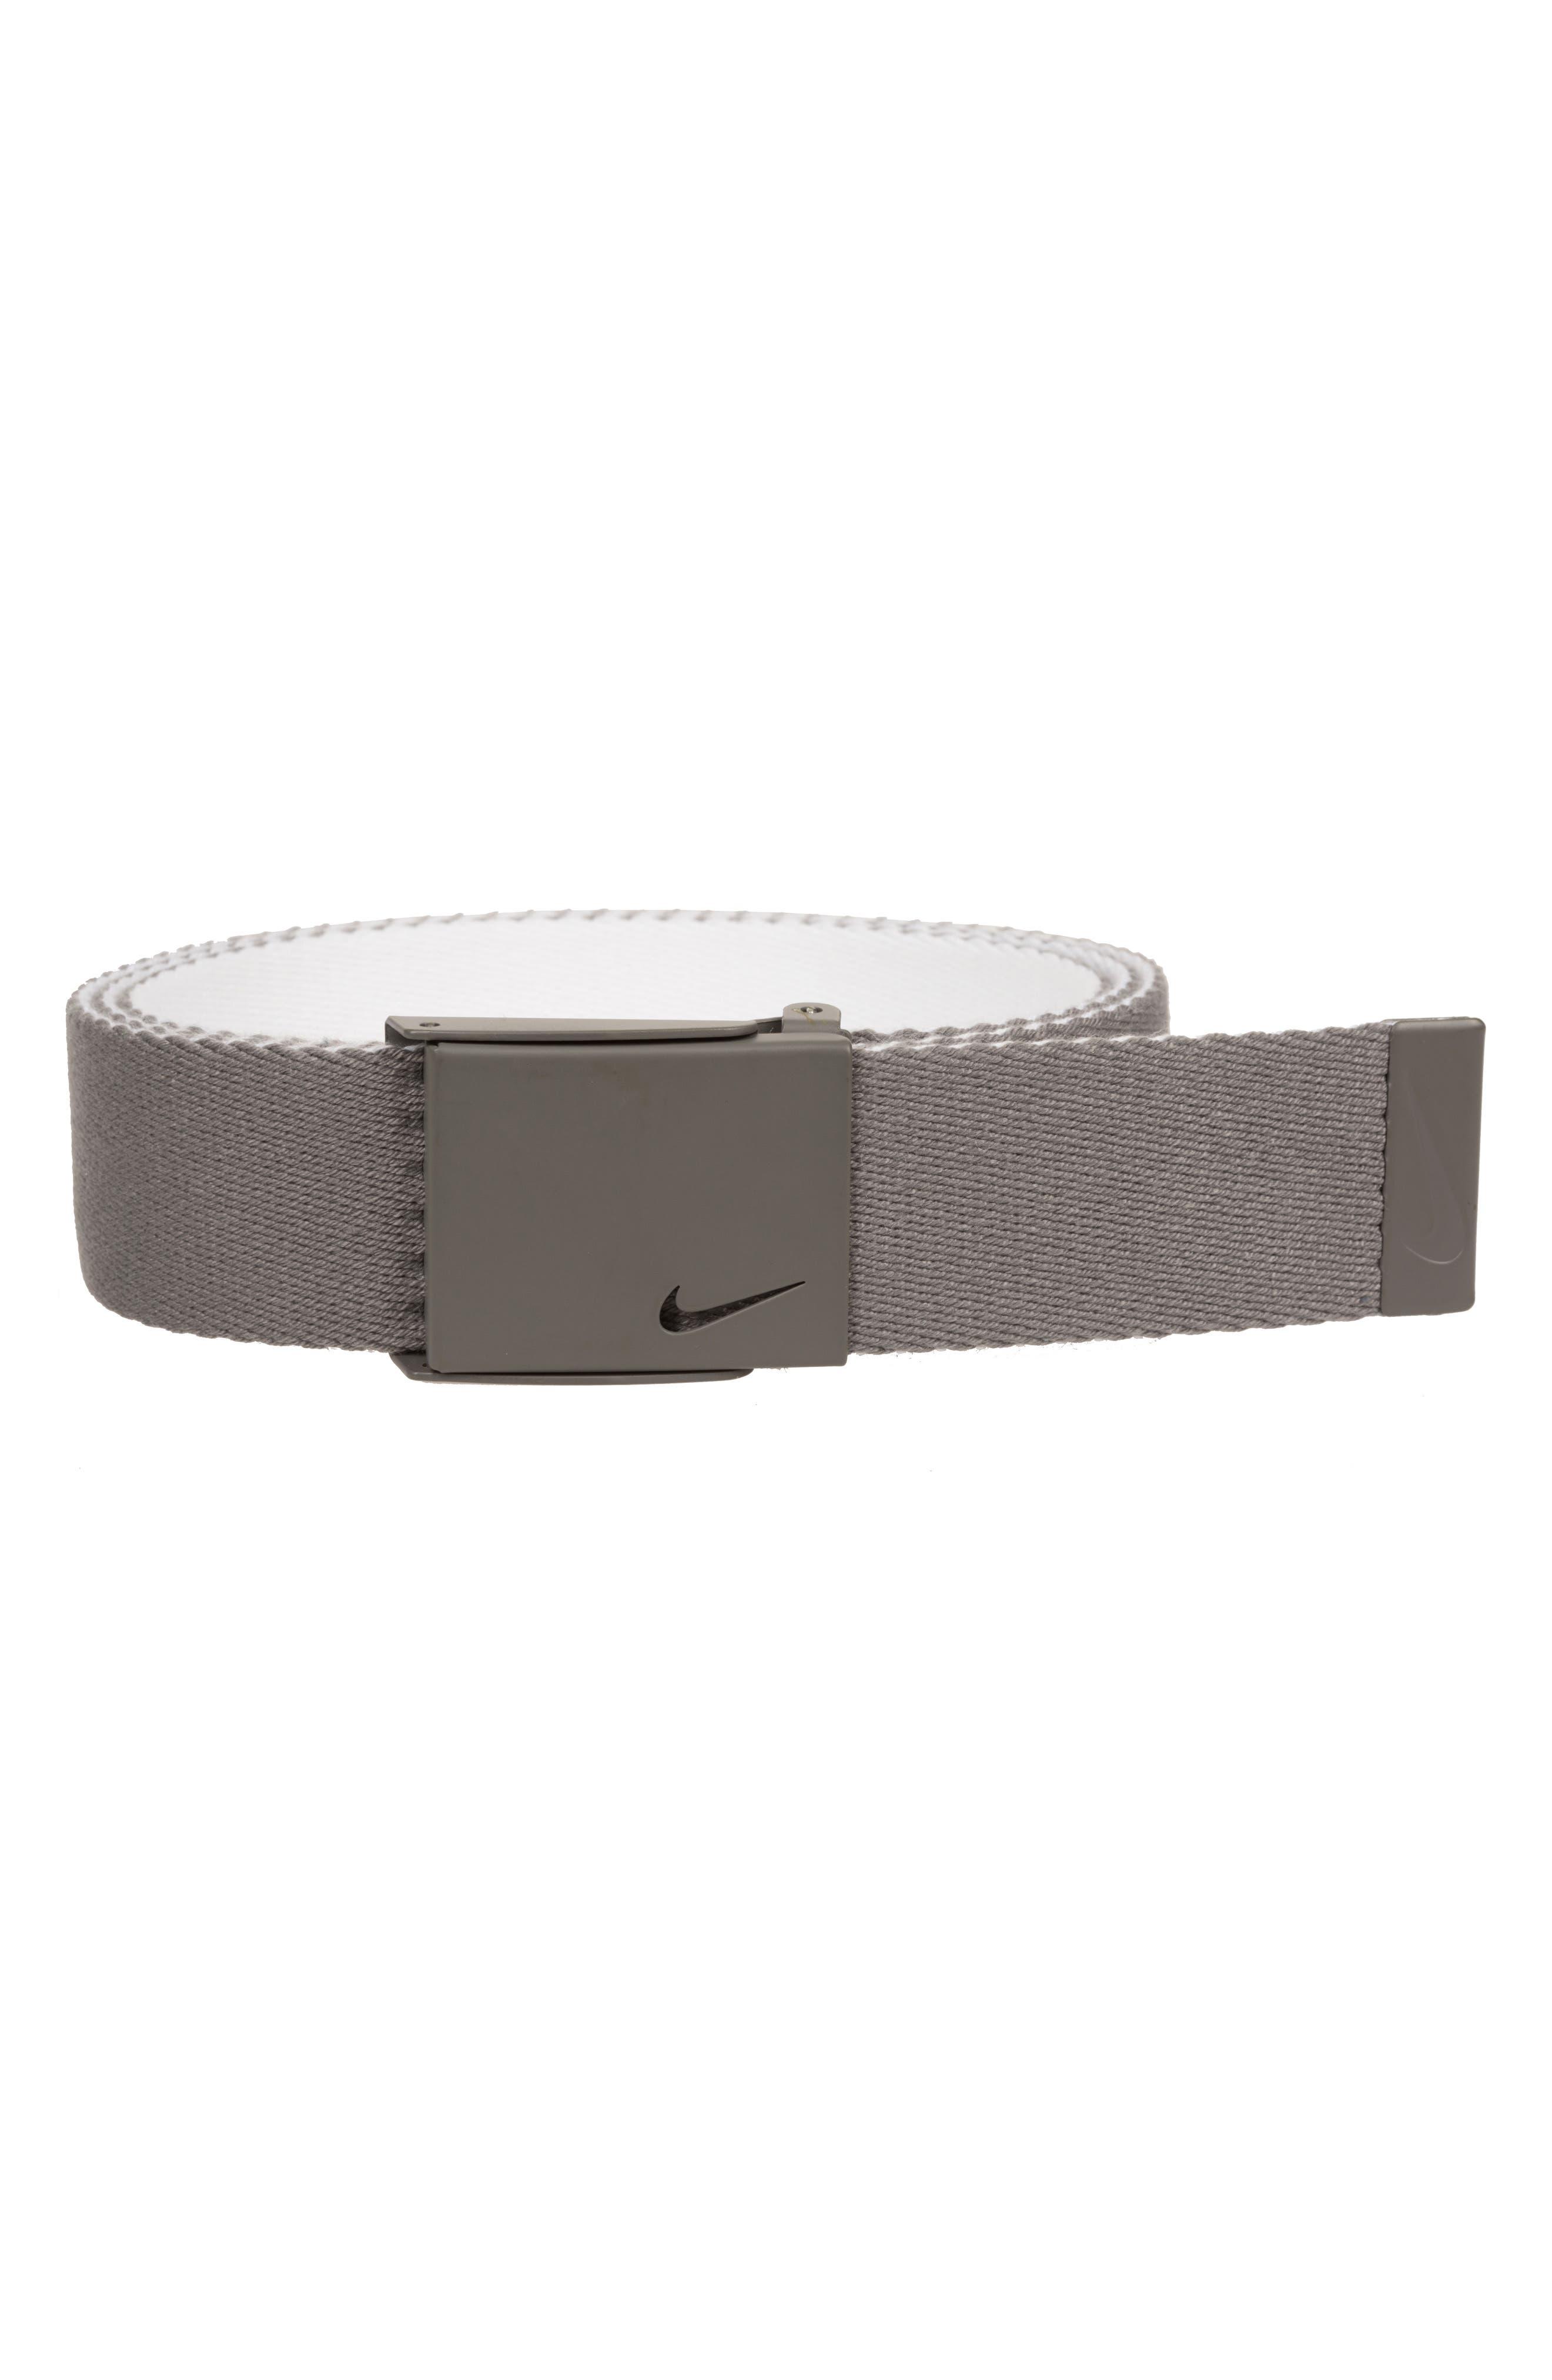 Essentials Reversible Webbed Belt,                             Main thumbnail 1, color,                             LIGHT CHARCOAL/ WHITE